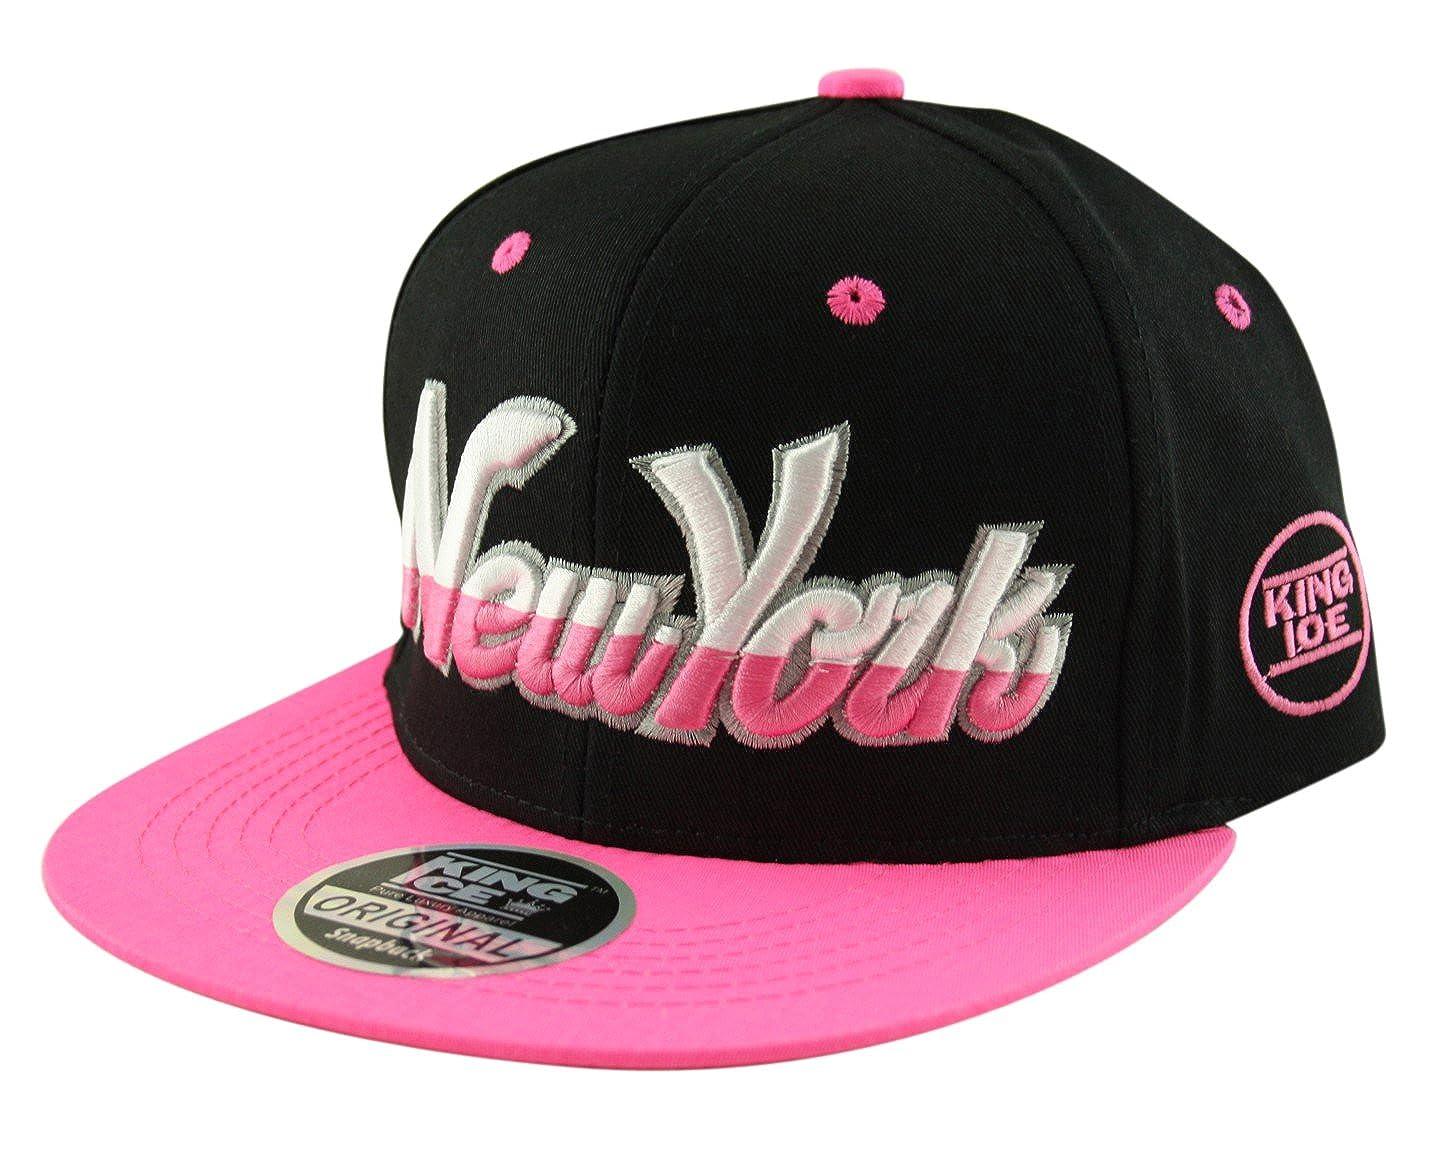 King Ice Snapback Hat Flat Peak Adult Adjustable Baseball Cap New York NY Script (Lots of colours black, pink, white , green, purple!)